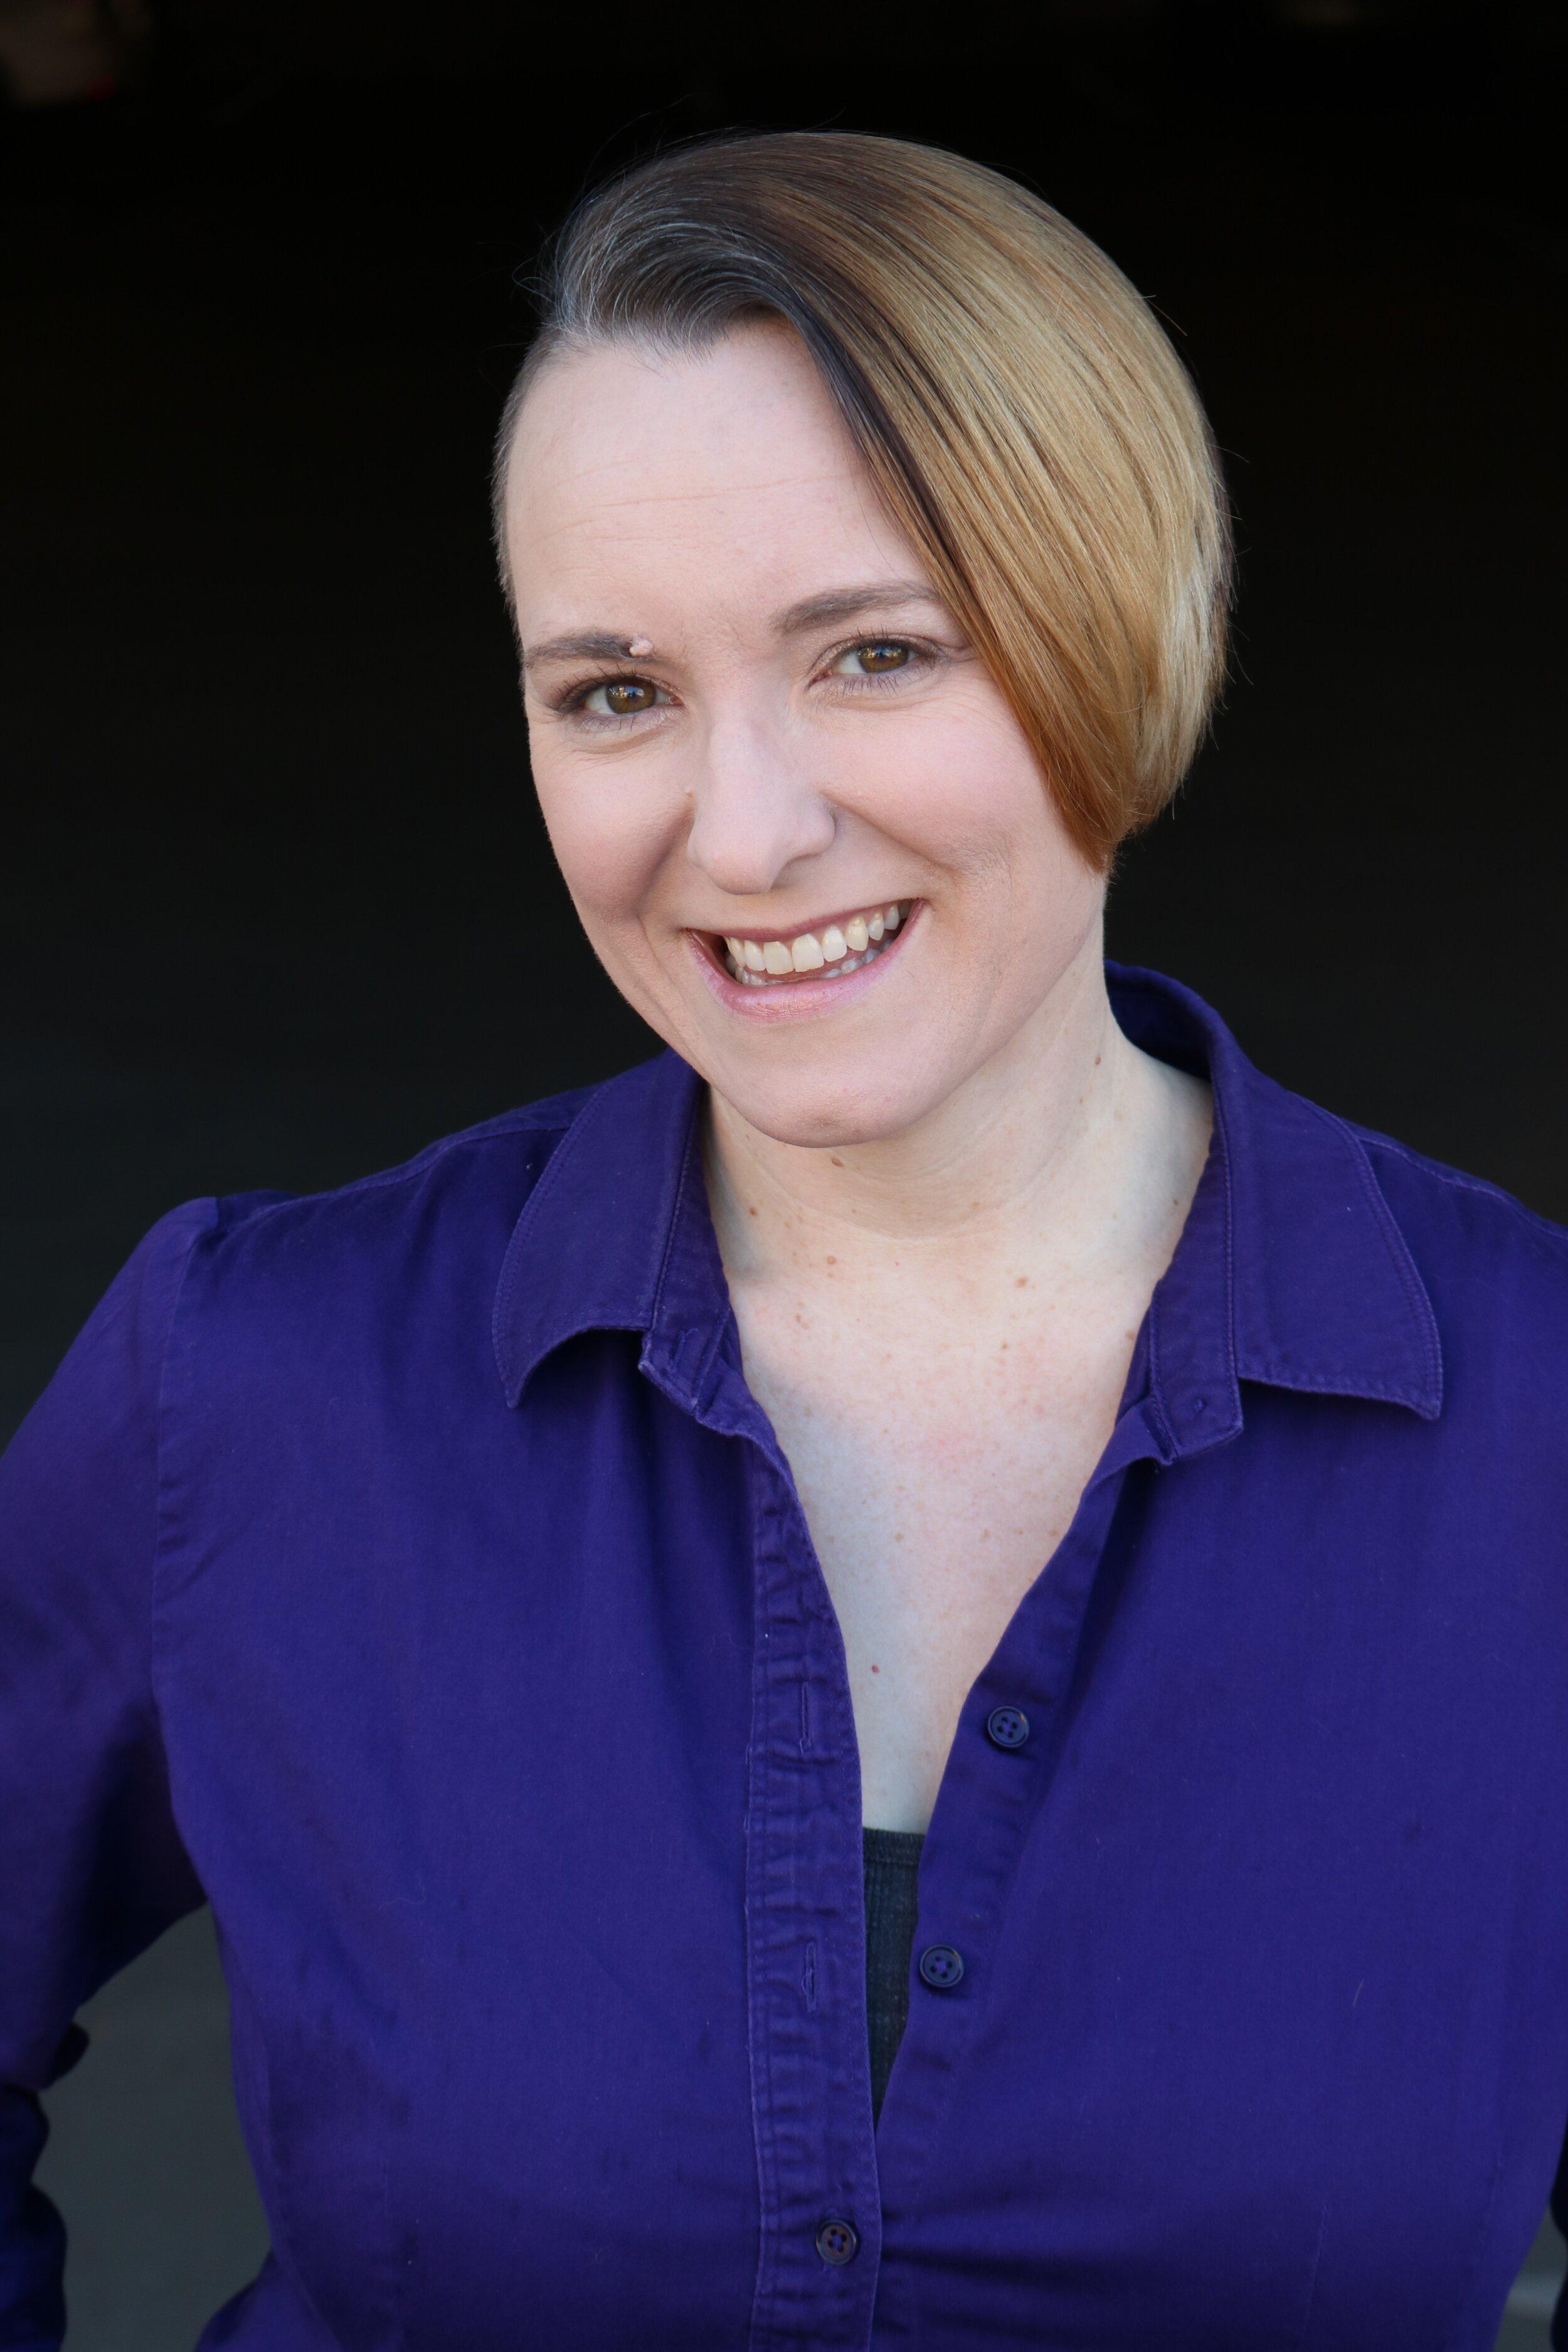 Valerie Rachele, stage director